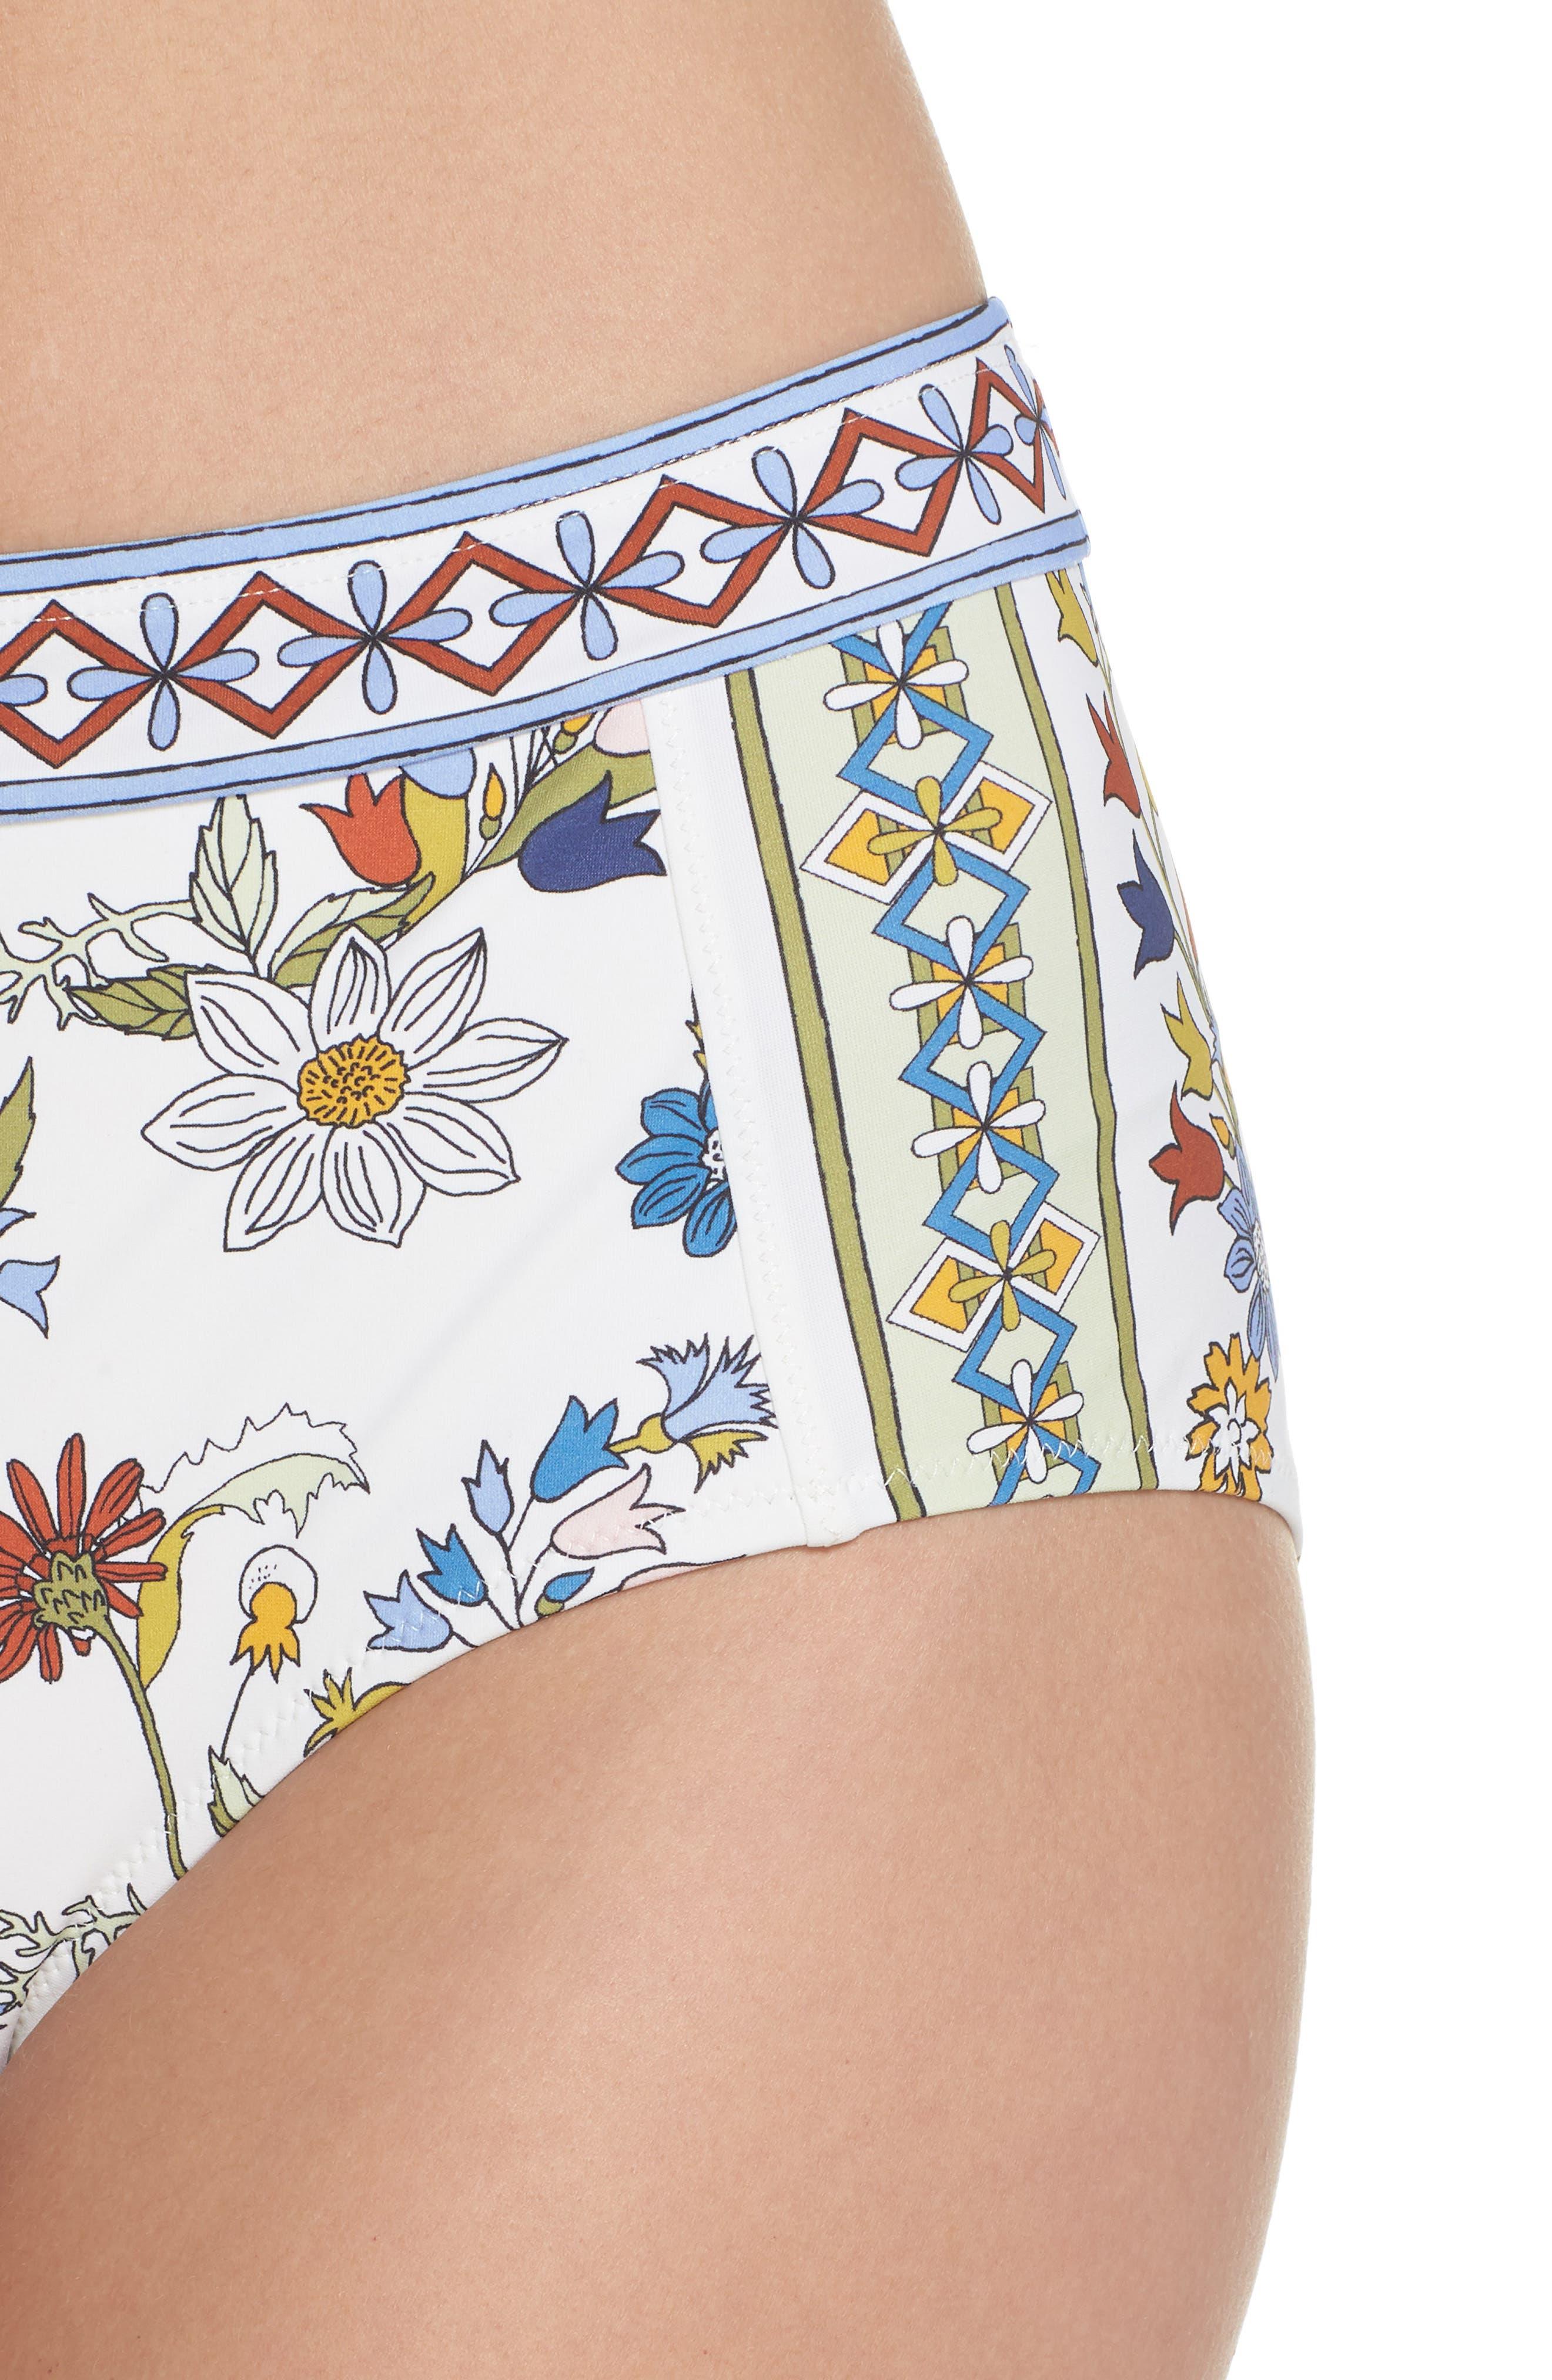 Meadow Folly High Waist Bikini Bottoms,                             Alternate thumbnail 4, color,                             900